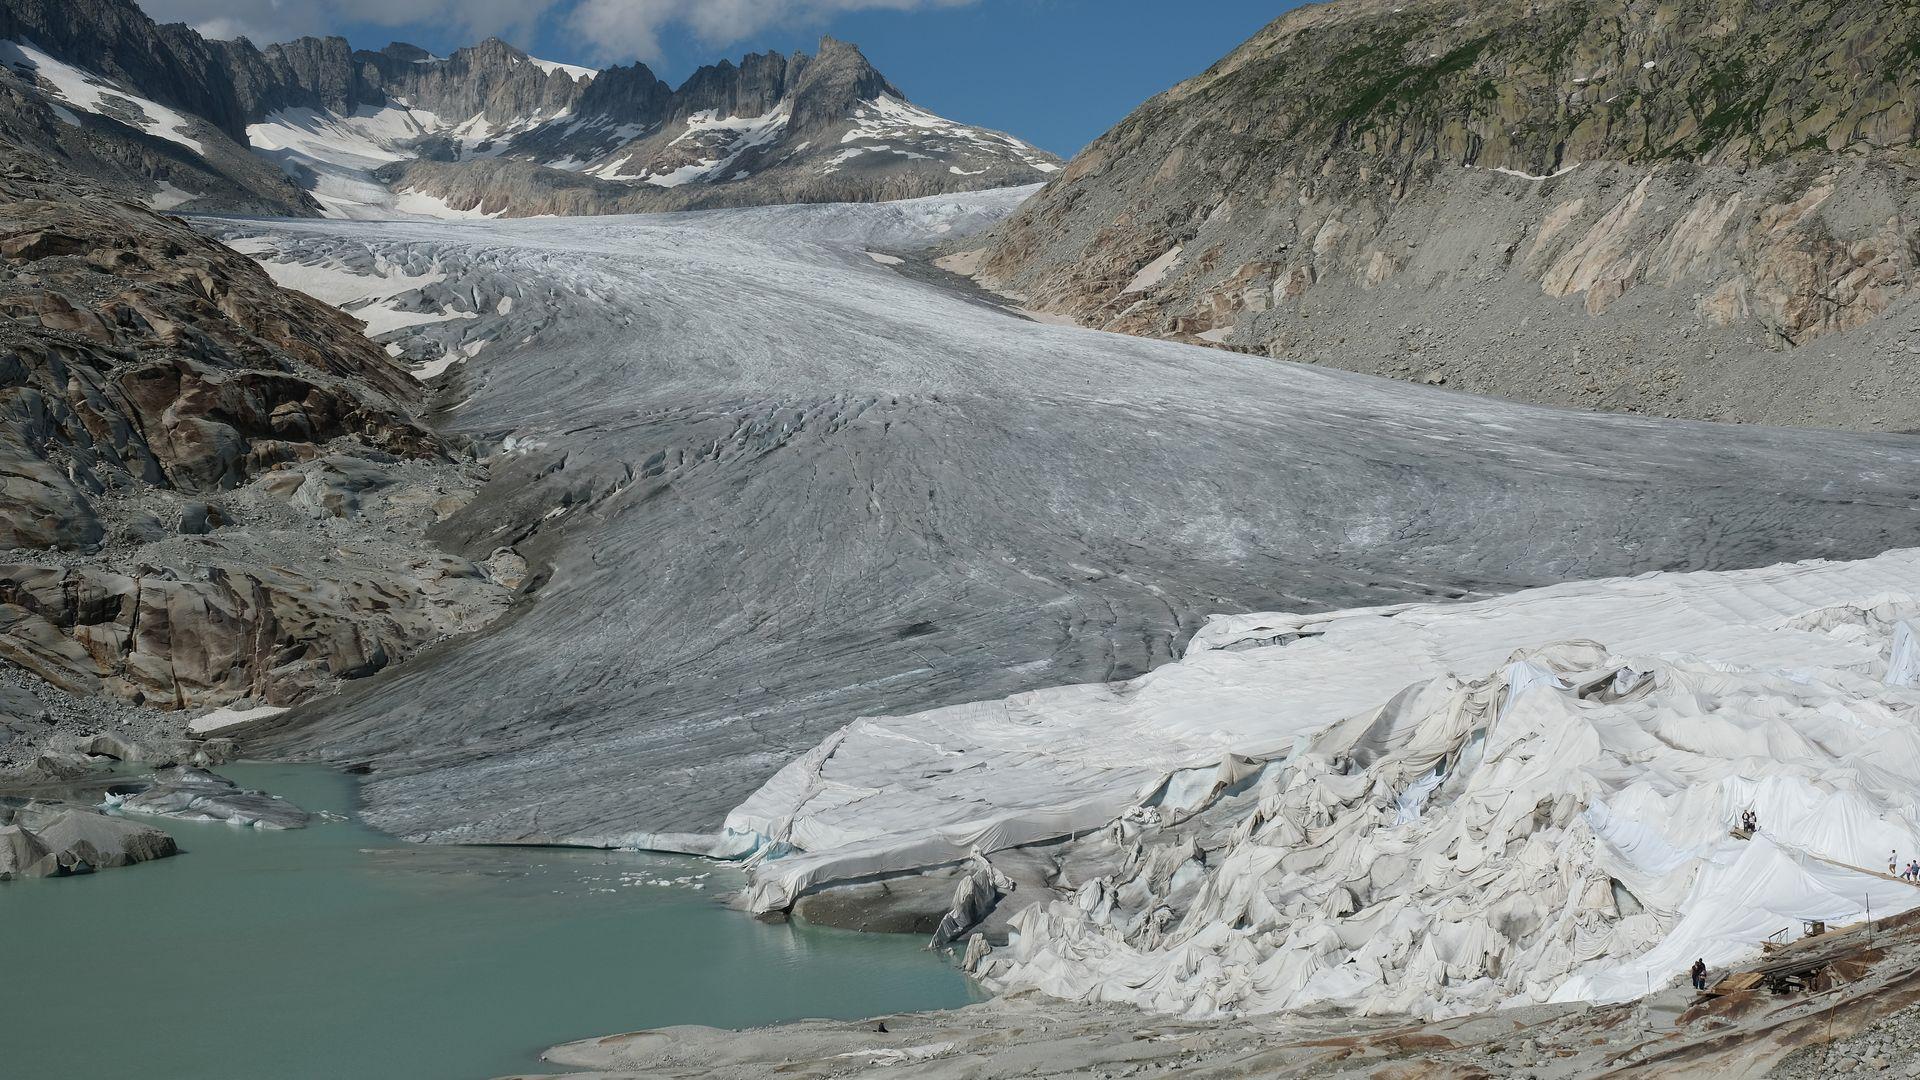 The Rhone glacier melting